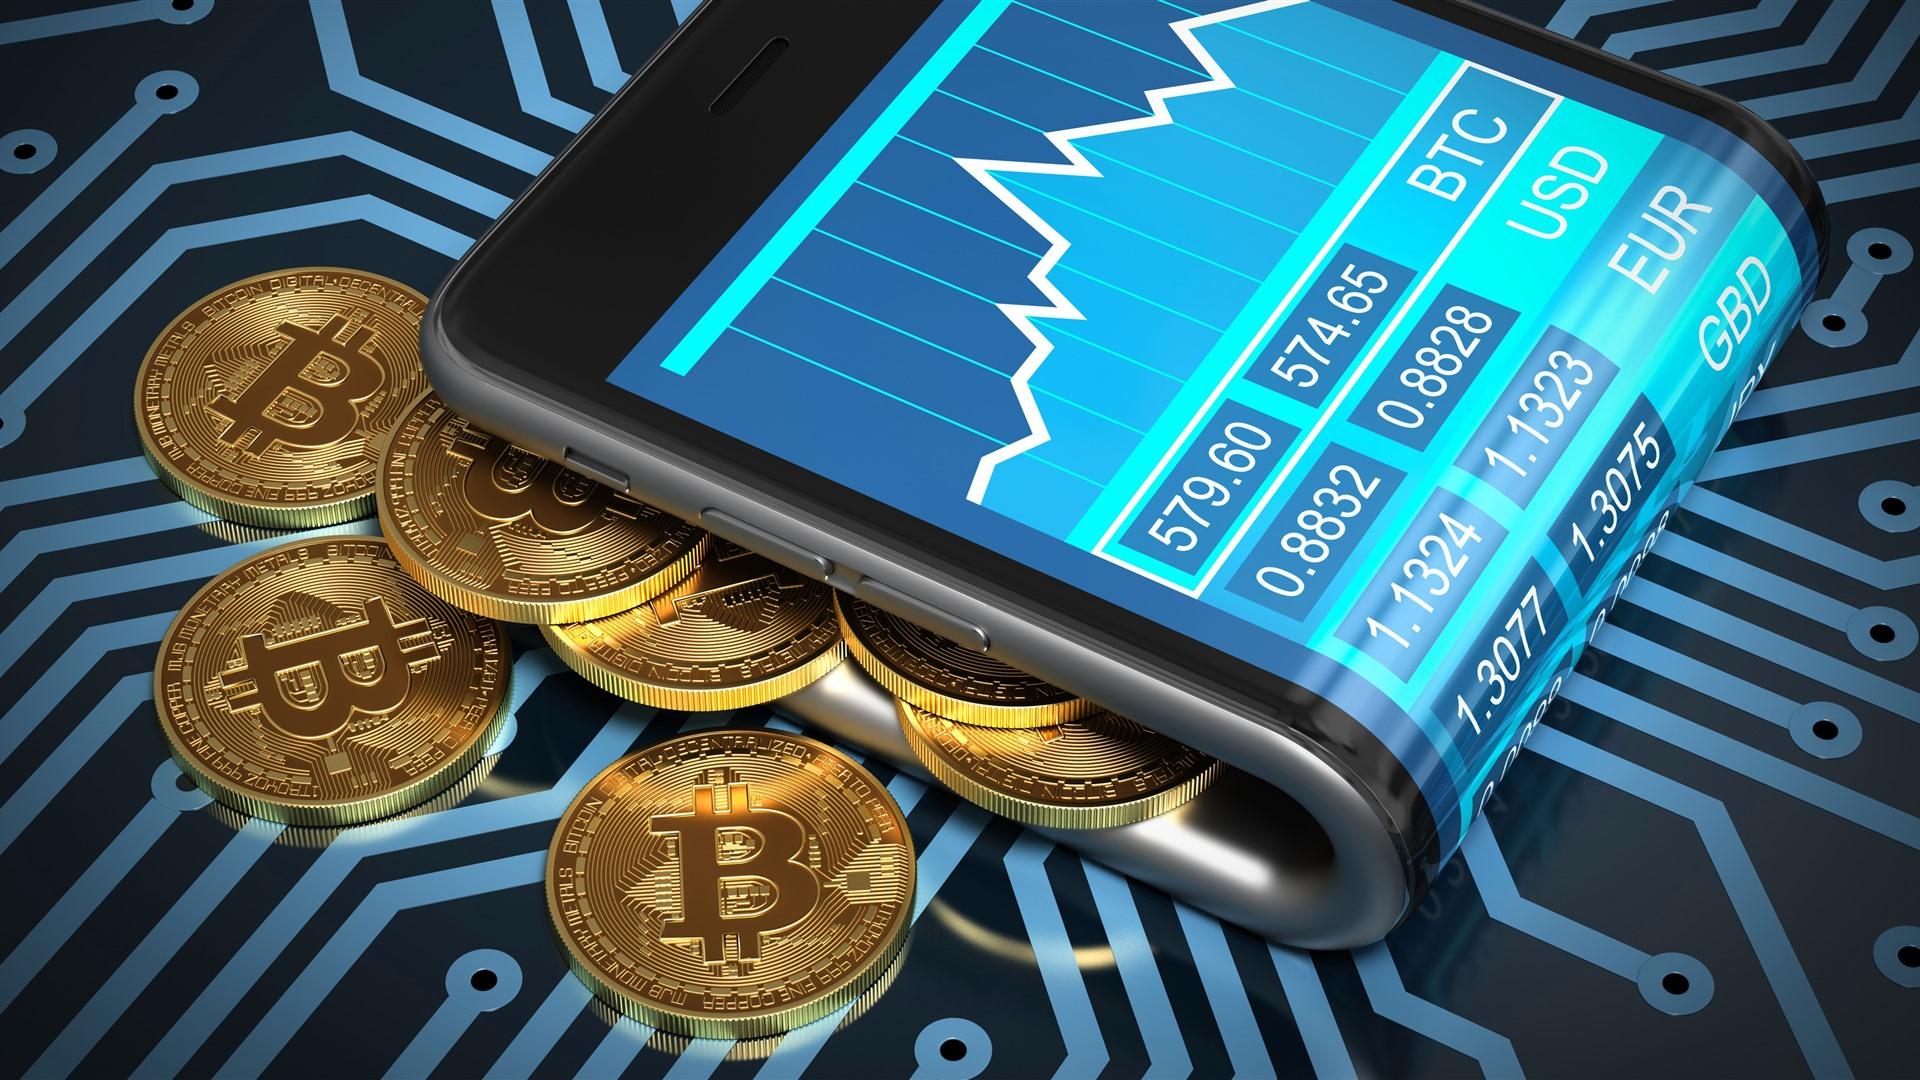 Wallpaper Bitcoin Currency Digital Money 3840x2160 Uhd